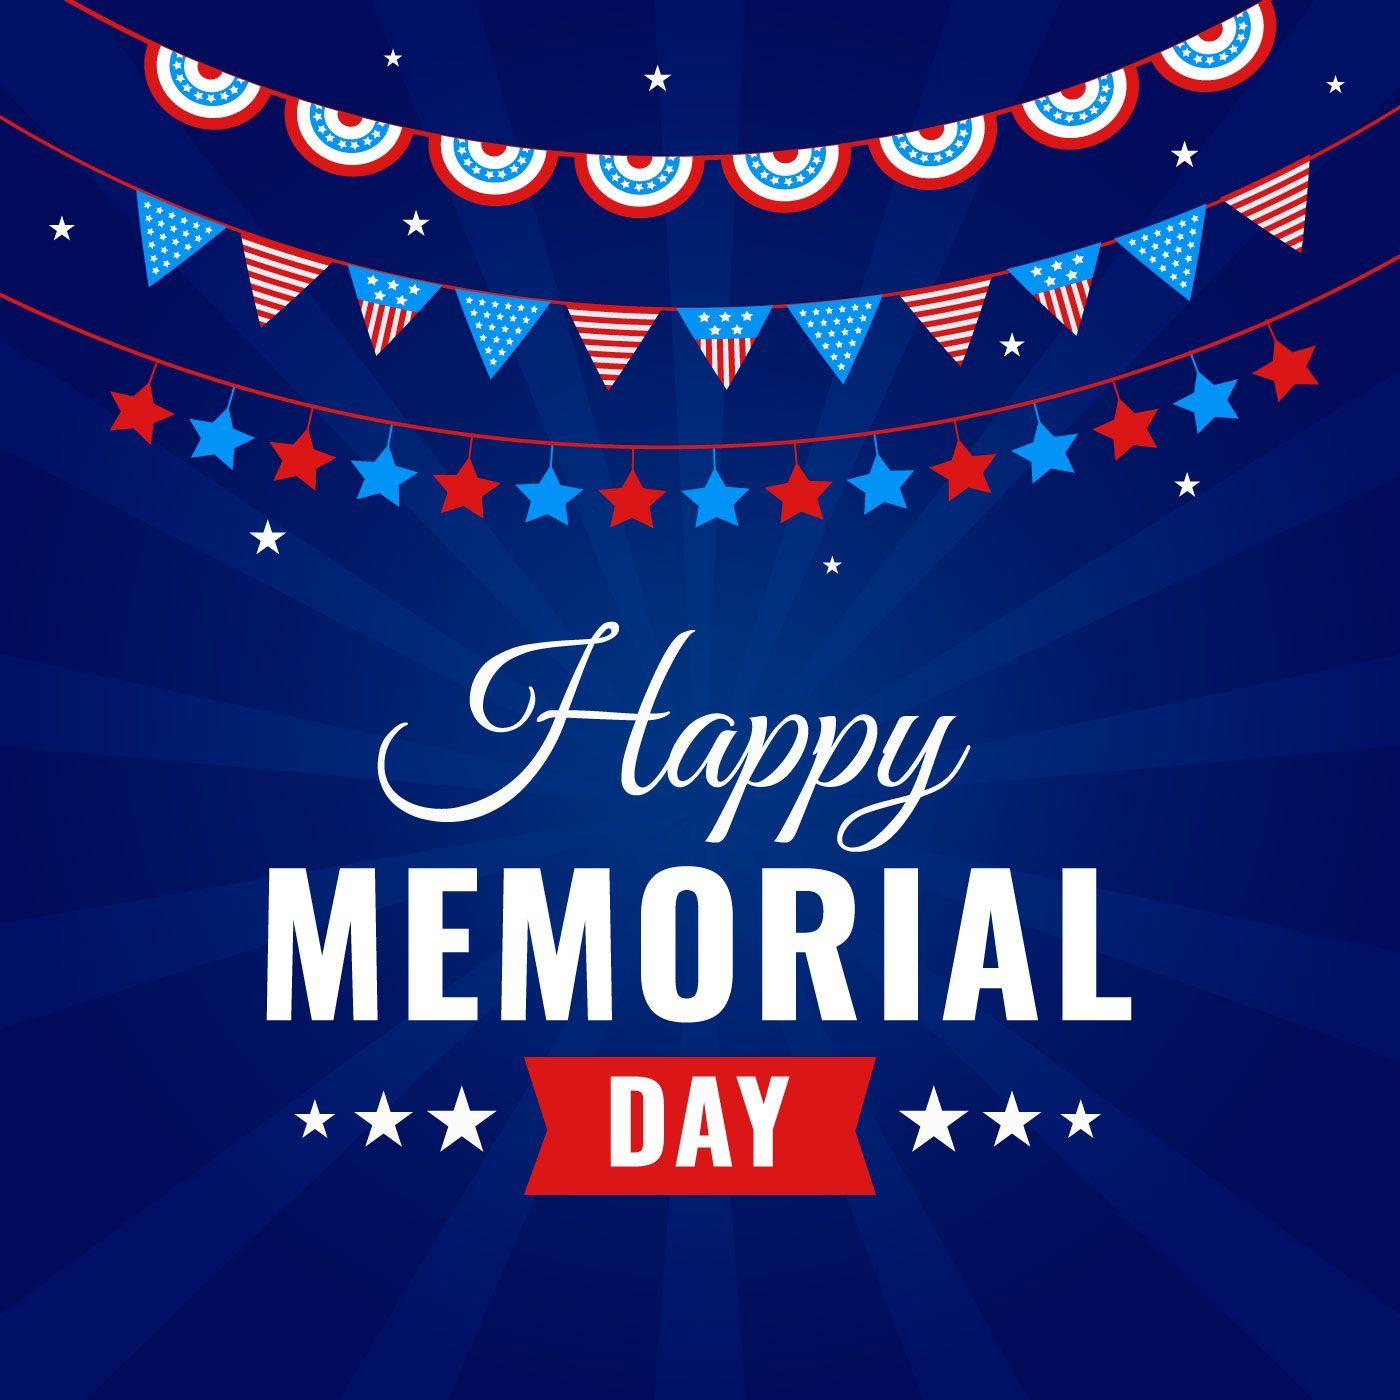 Happy Memorial Day Celebration Download Free Vector Art Stock Graphics Images Happy Memorial Day Memorial Day Quotes Memorial Day Celebrations